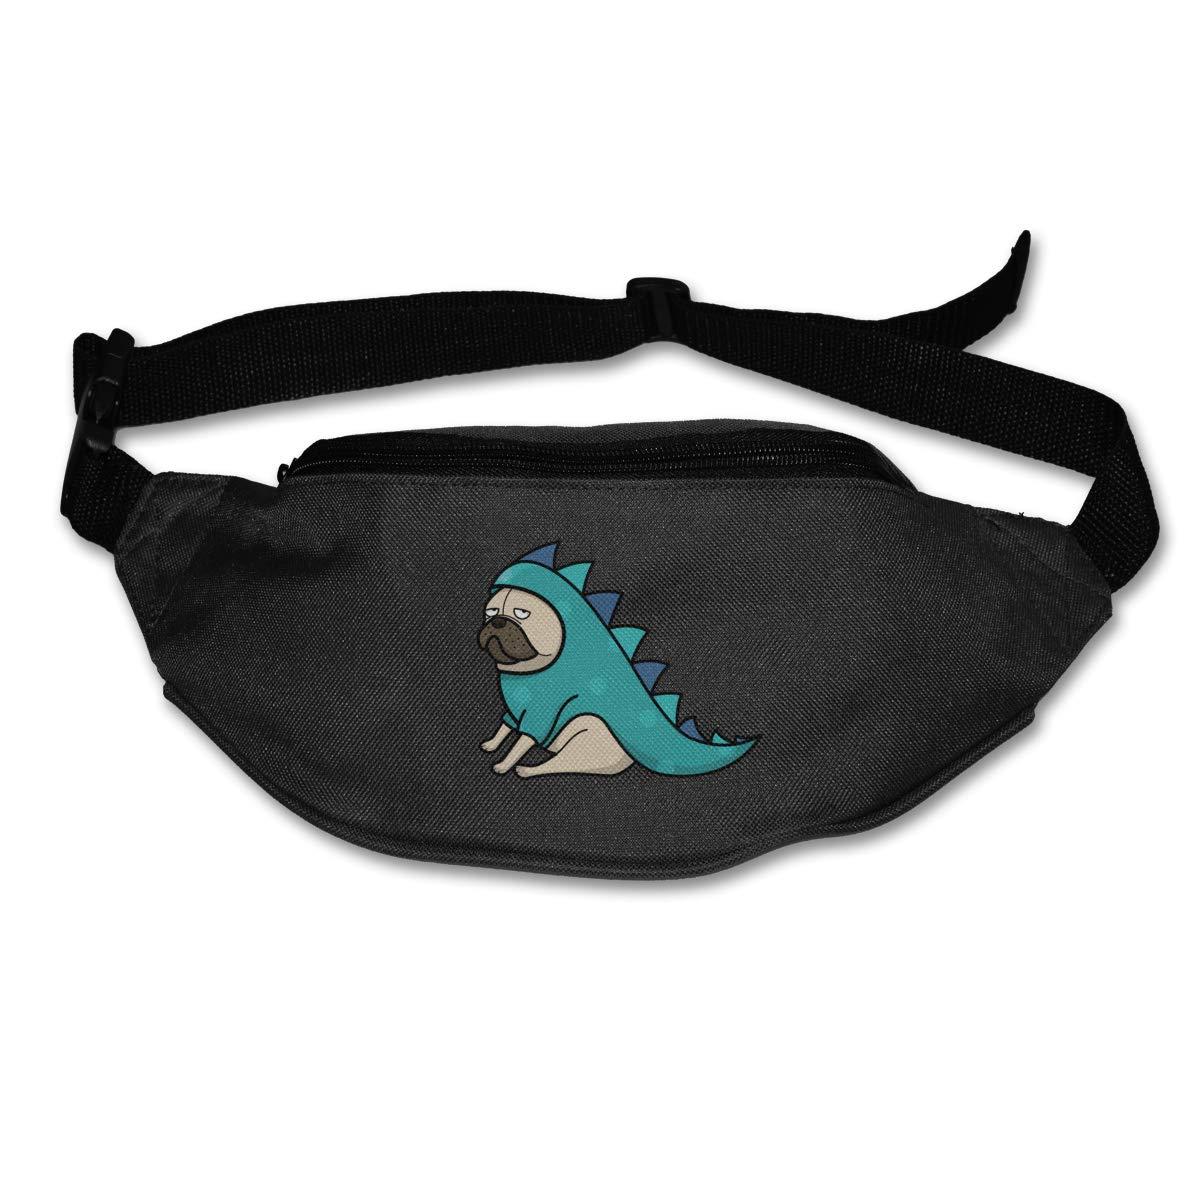 Dinosaur Pug Dog Sport Waist Packs Fanny Pack Adjustable For Hike